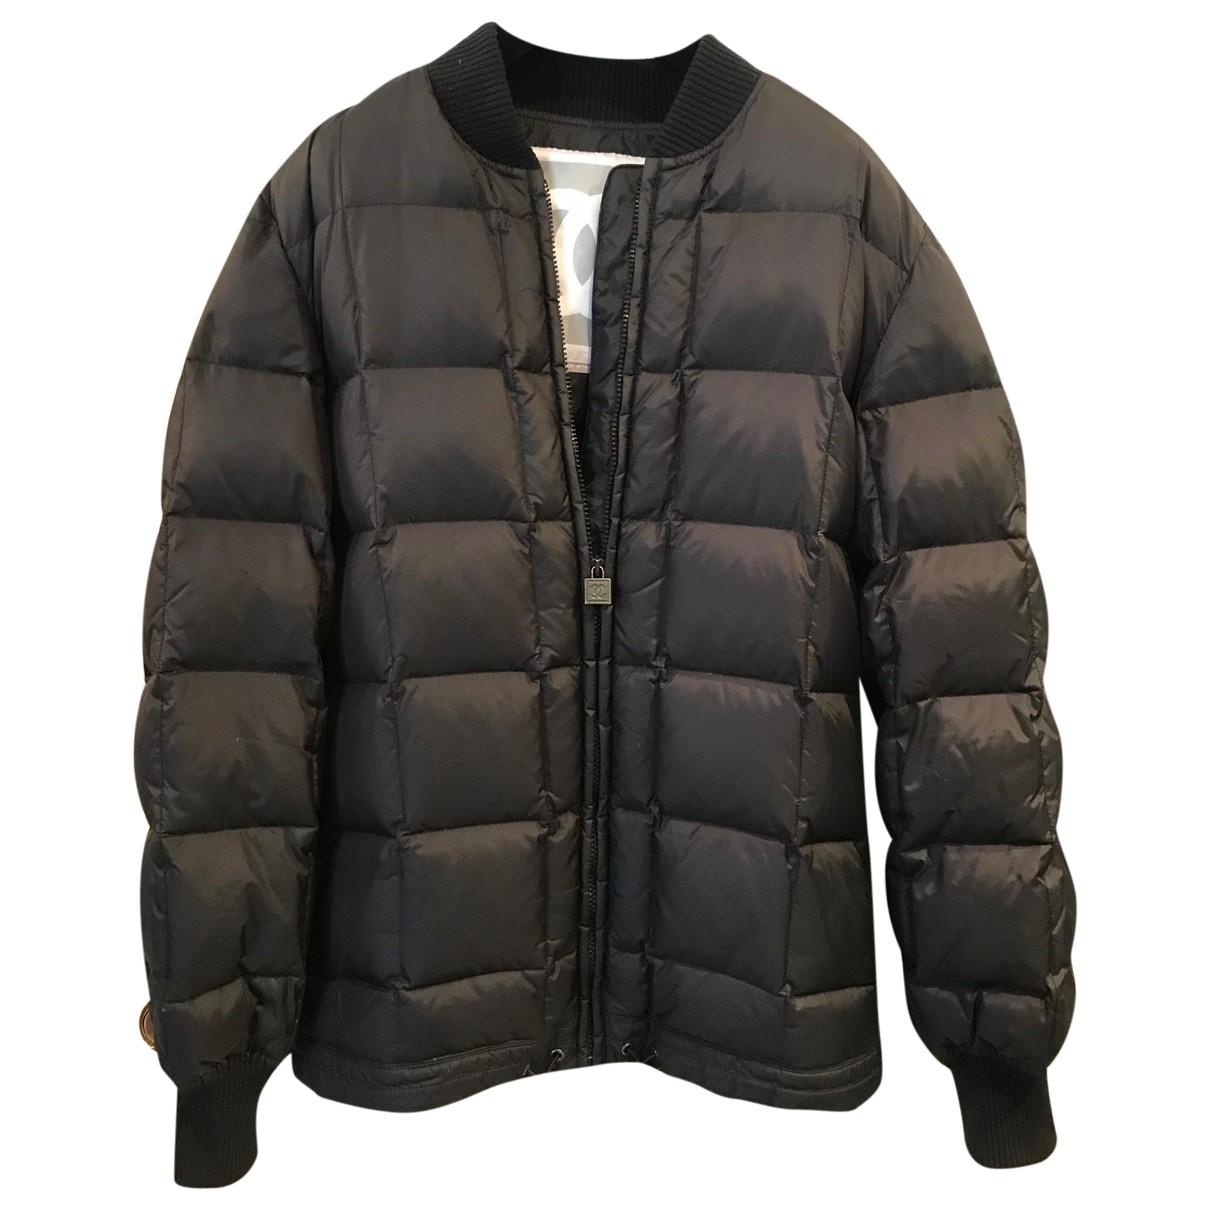 Chanel \N Black Leather jacket for Women 40 FR